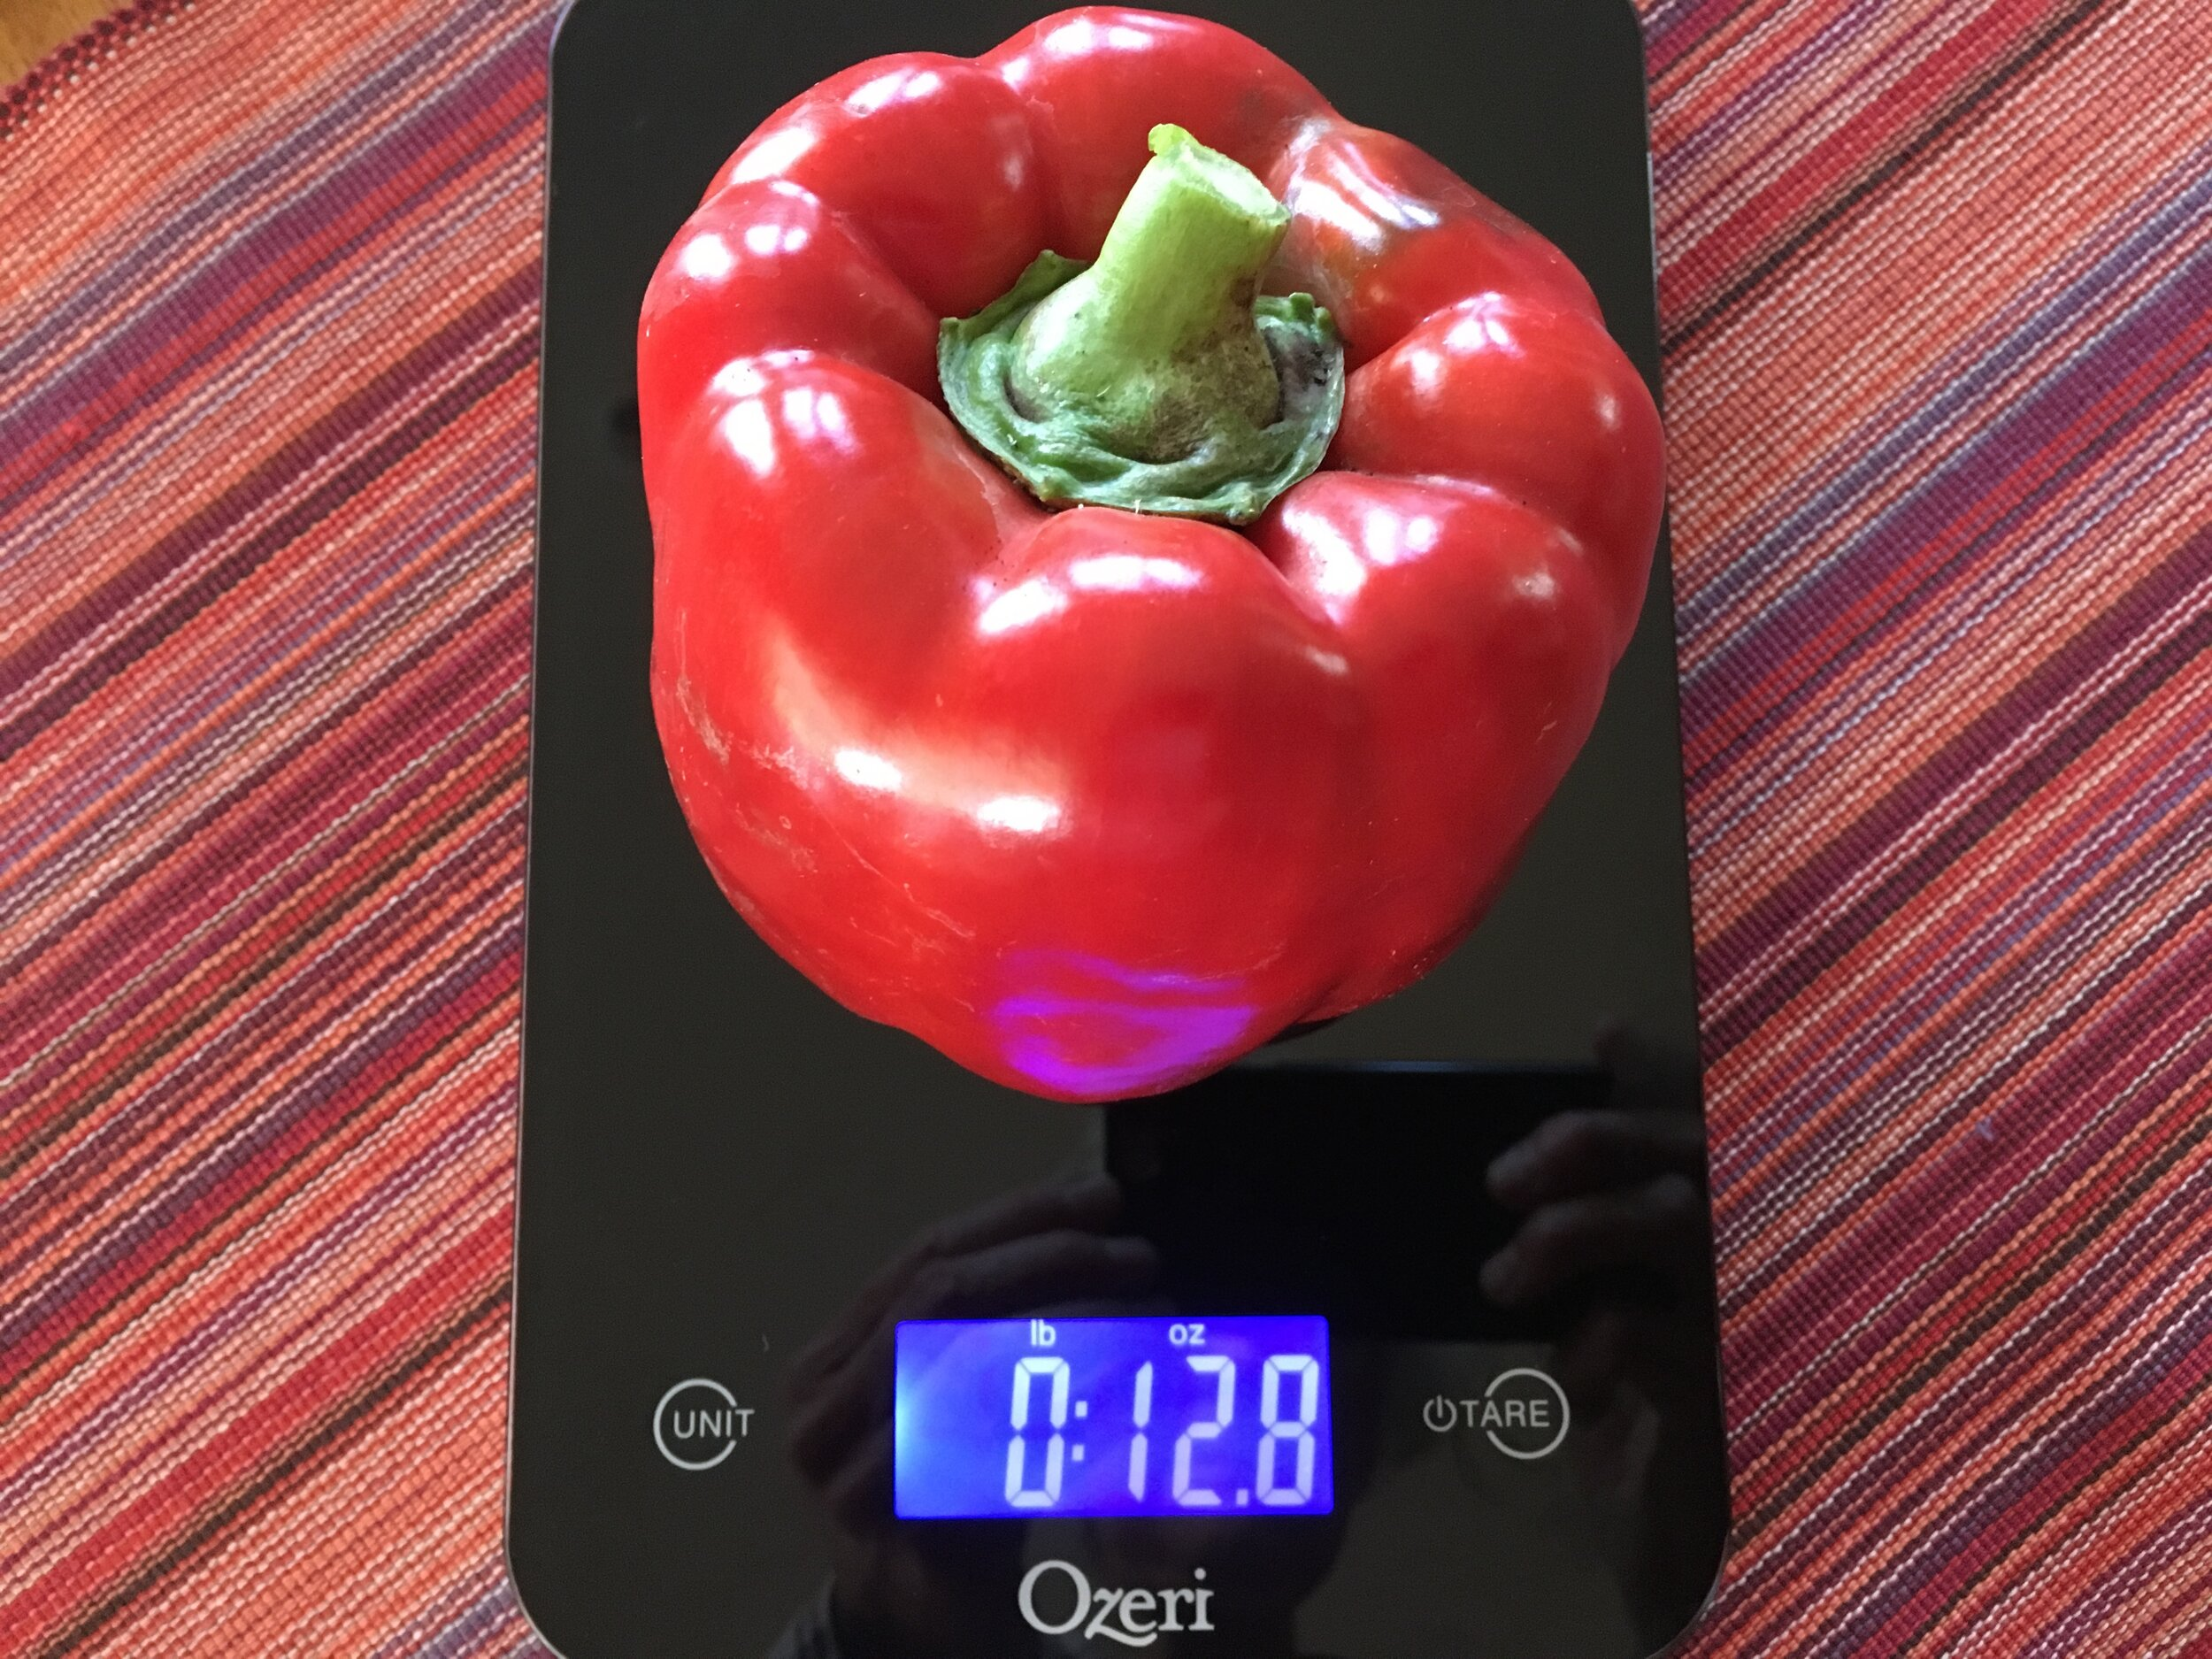 'Red Beauty' bell pepper